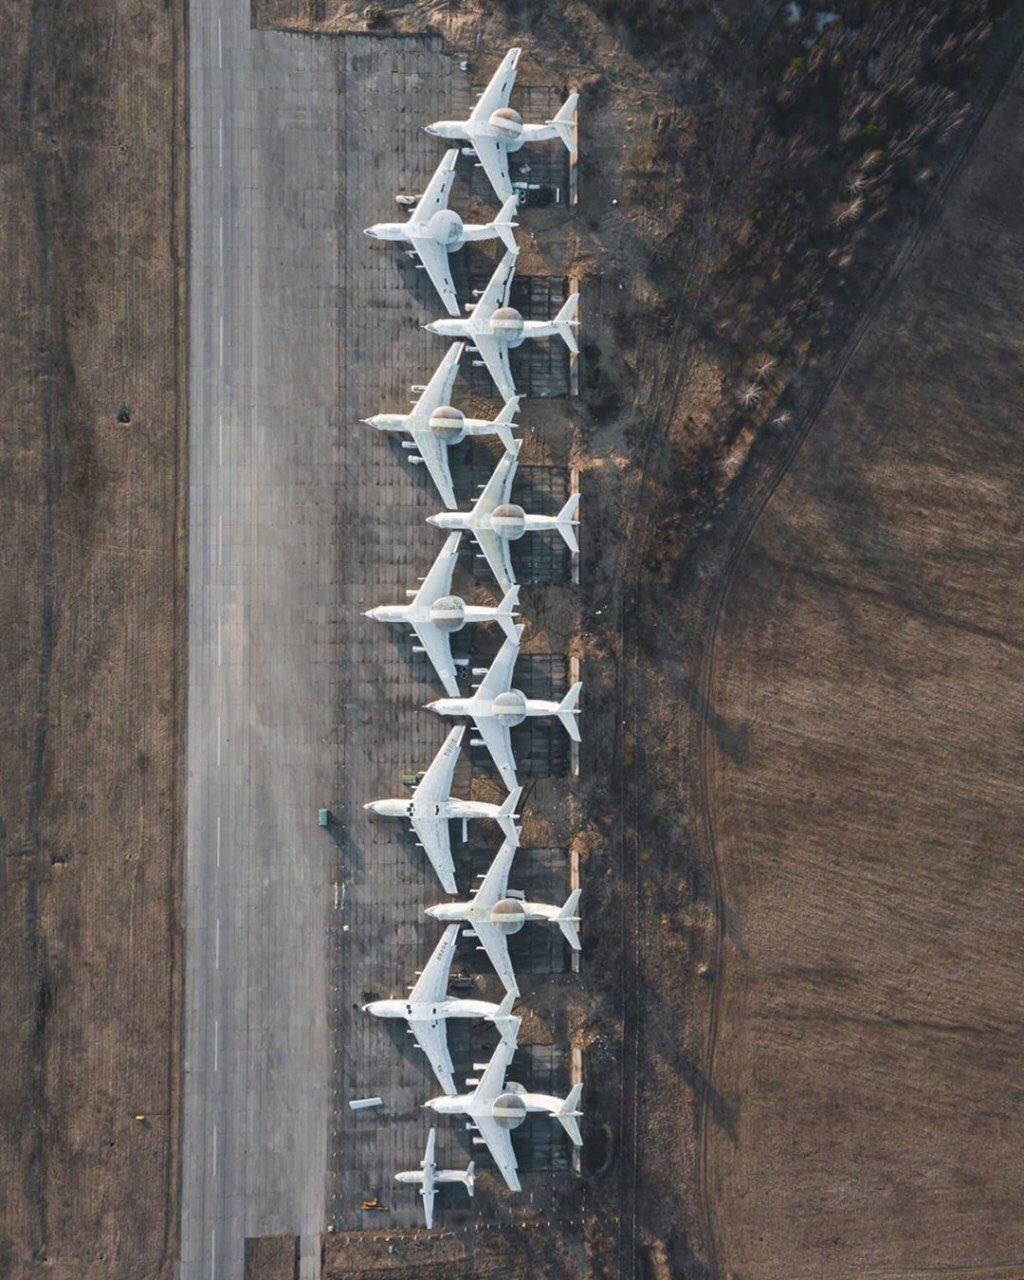 AWACS/Command post aircrafts of RuAF - Page 11 Euhfn610